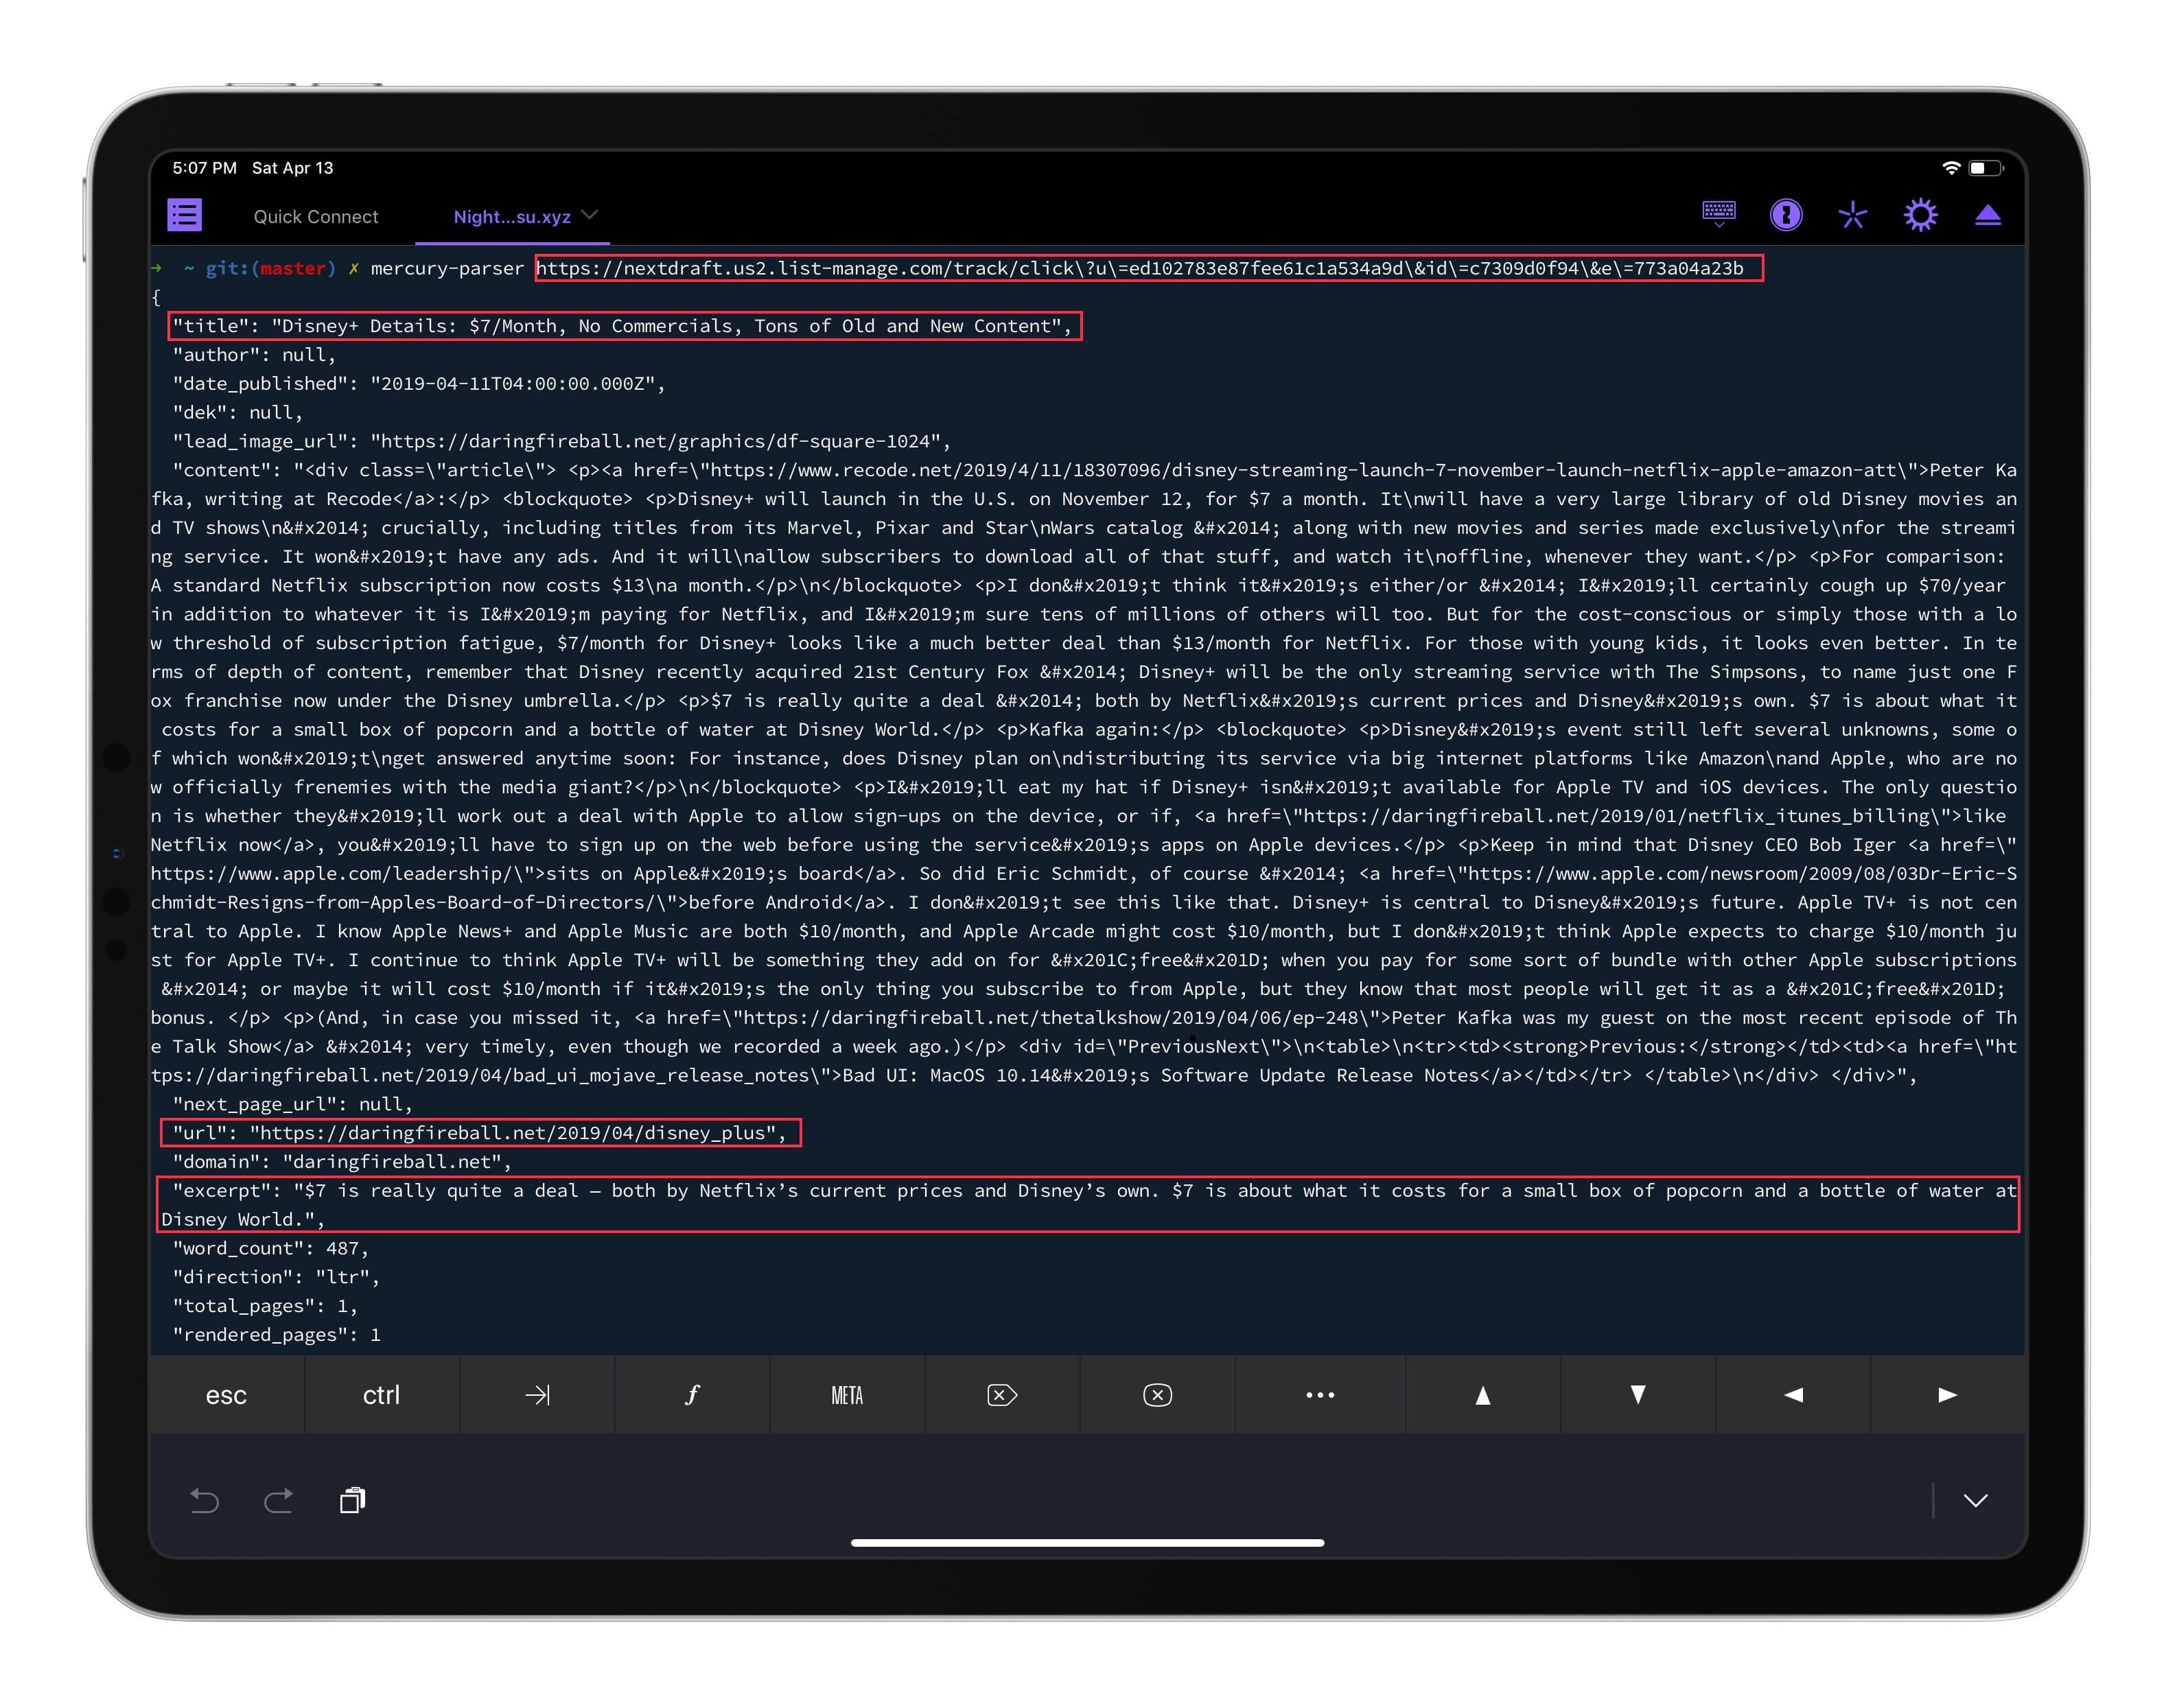 Mercury 正确获取了跳转 URL 指向的原始网页相关信息